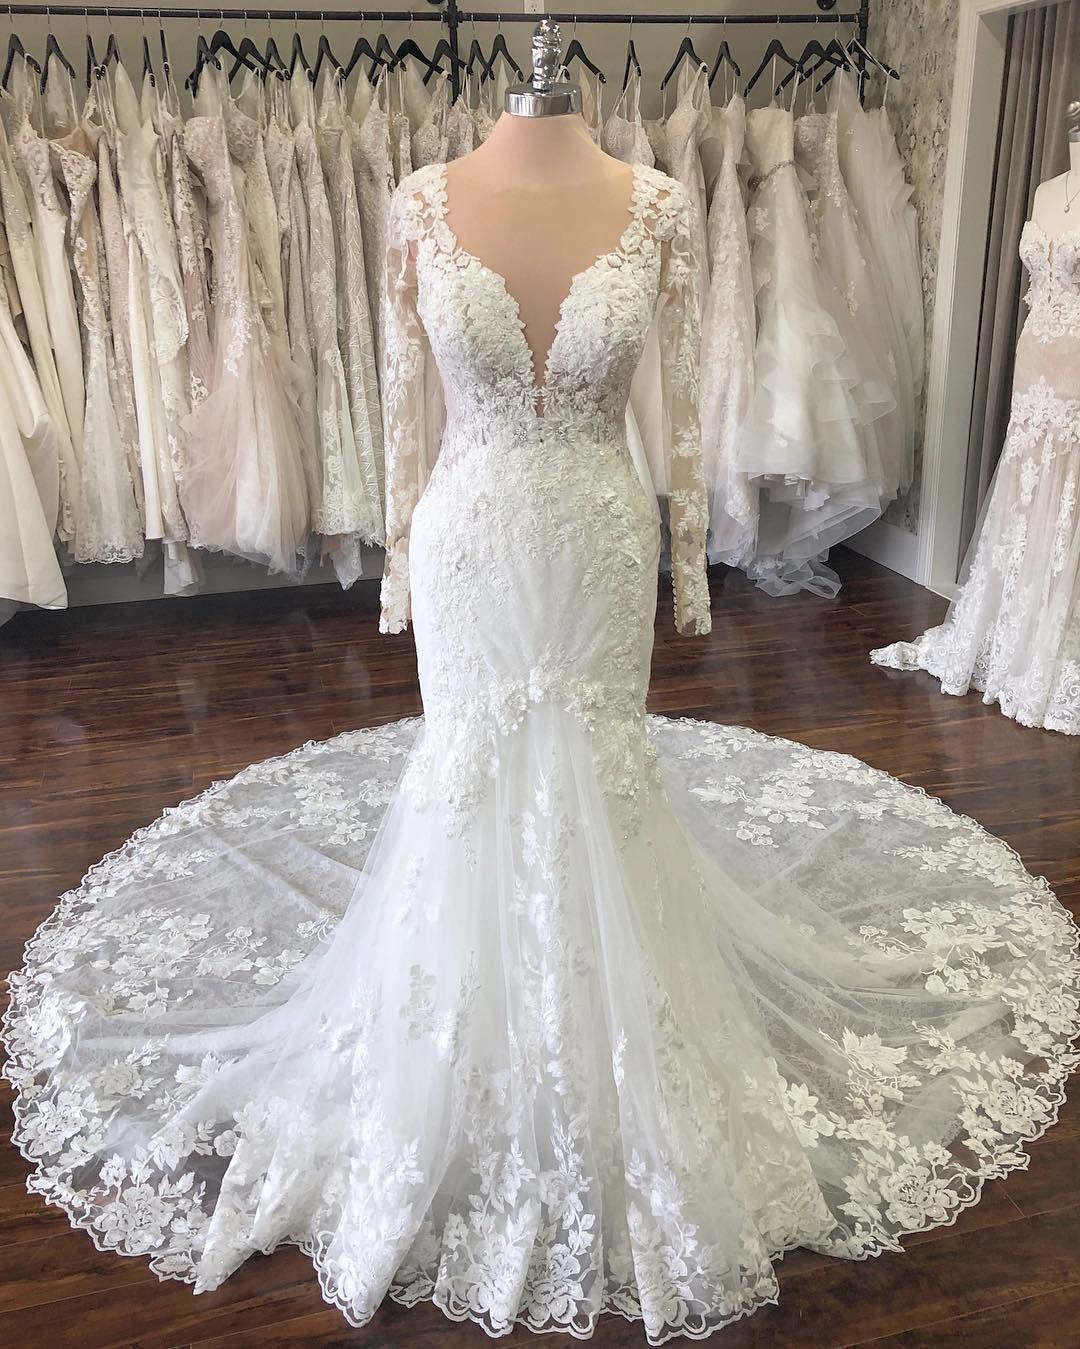 The Wedding Studio Weddingstudiocarmel Instagram Photos And Vide Long Sleeve Wedding Dress Lace Long Train Wedding Dress Cheap Long Sleeve Wedding Dresses